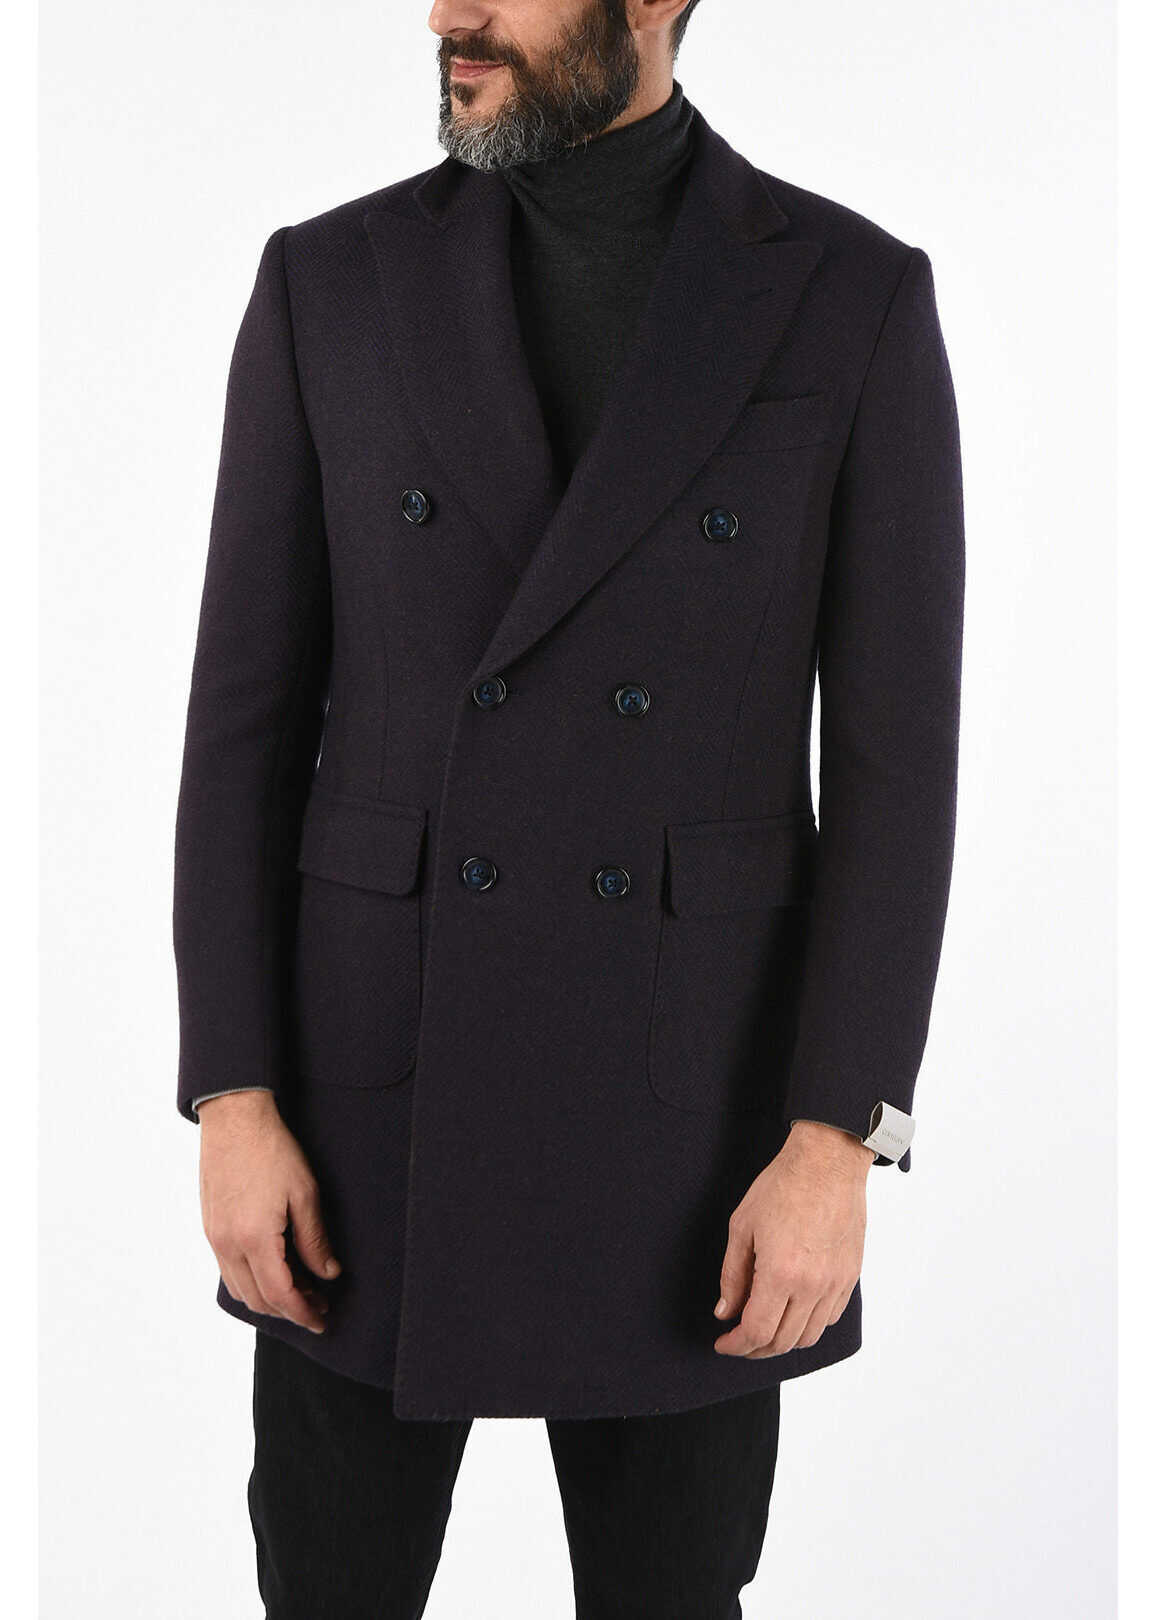 CORNELIANI cashmere and virgin wool hidden closure coat VIOLET imagine